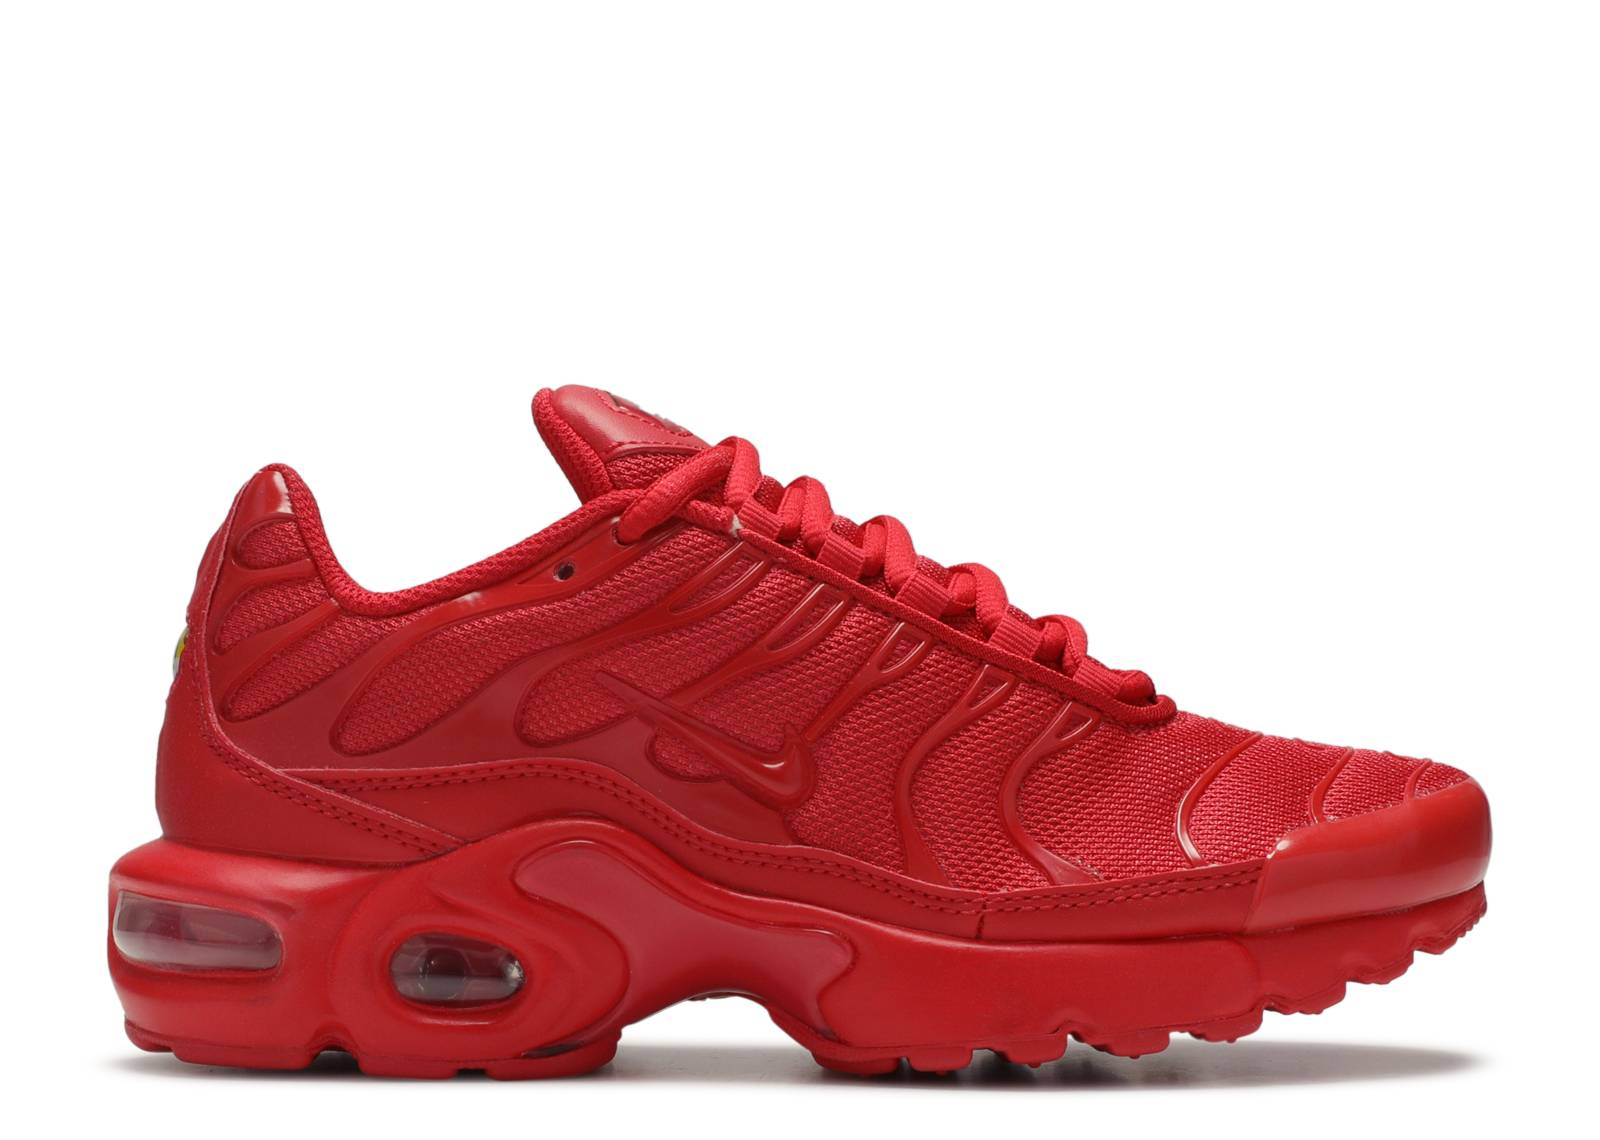 BUY Nike Air Max Plus White University Red | Kixify Marketplace